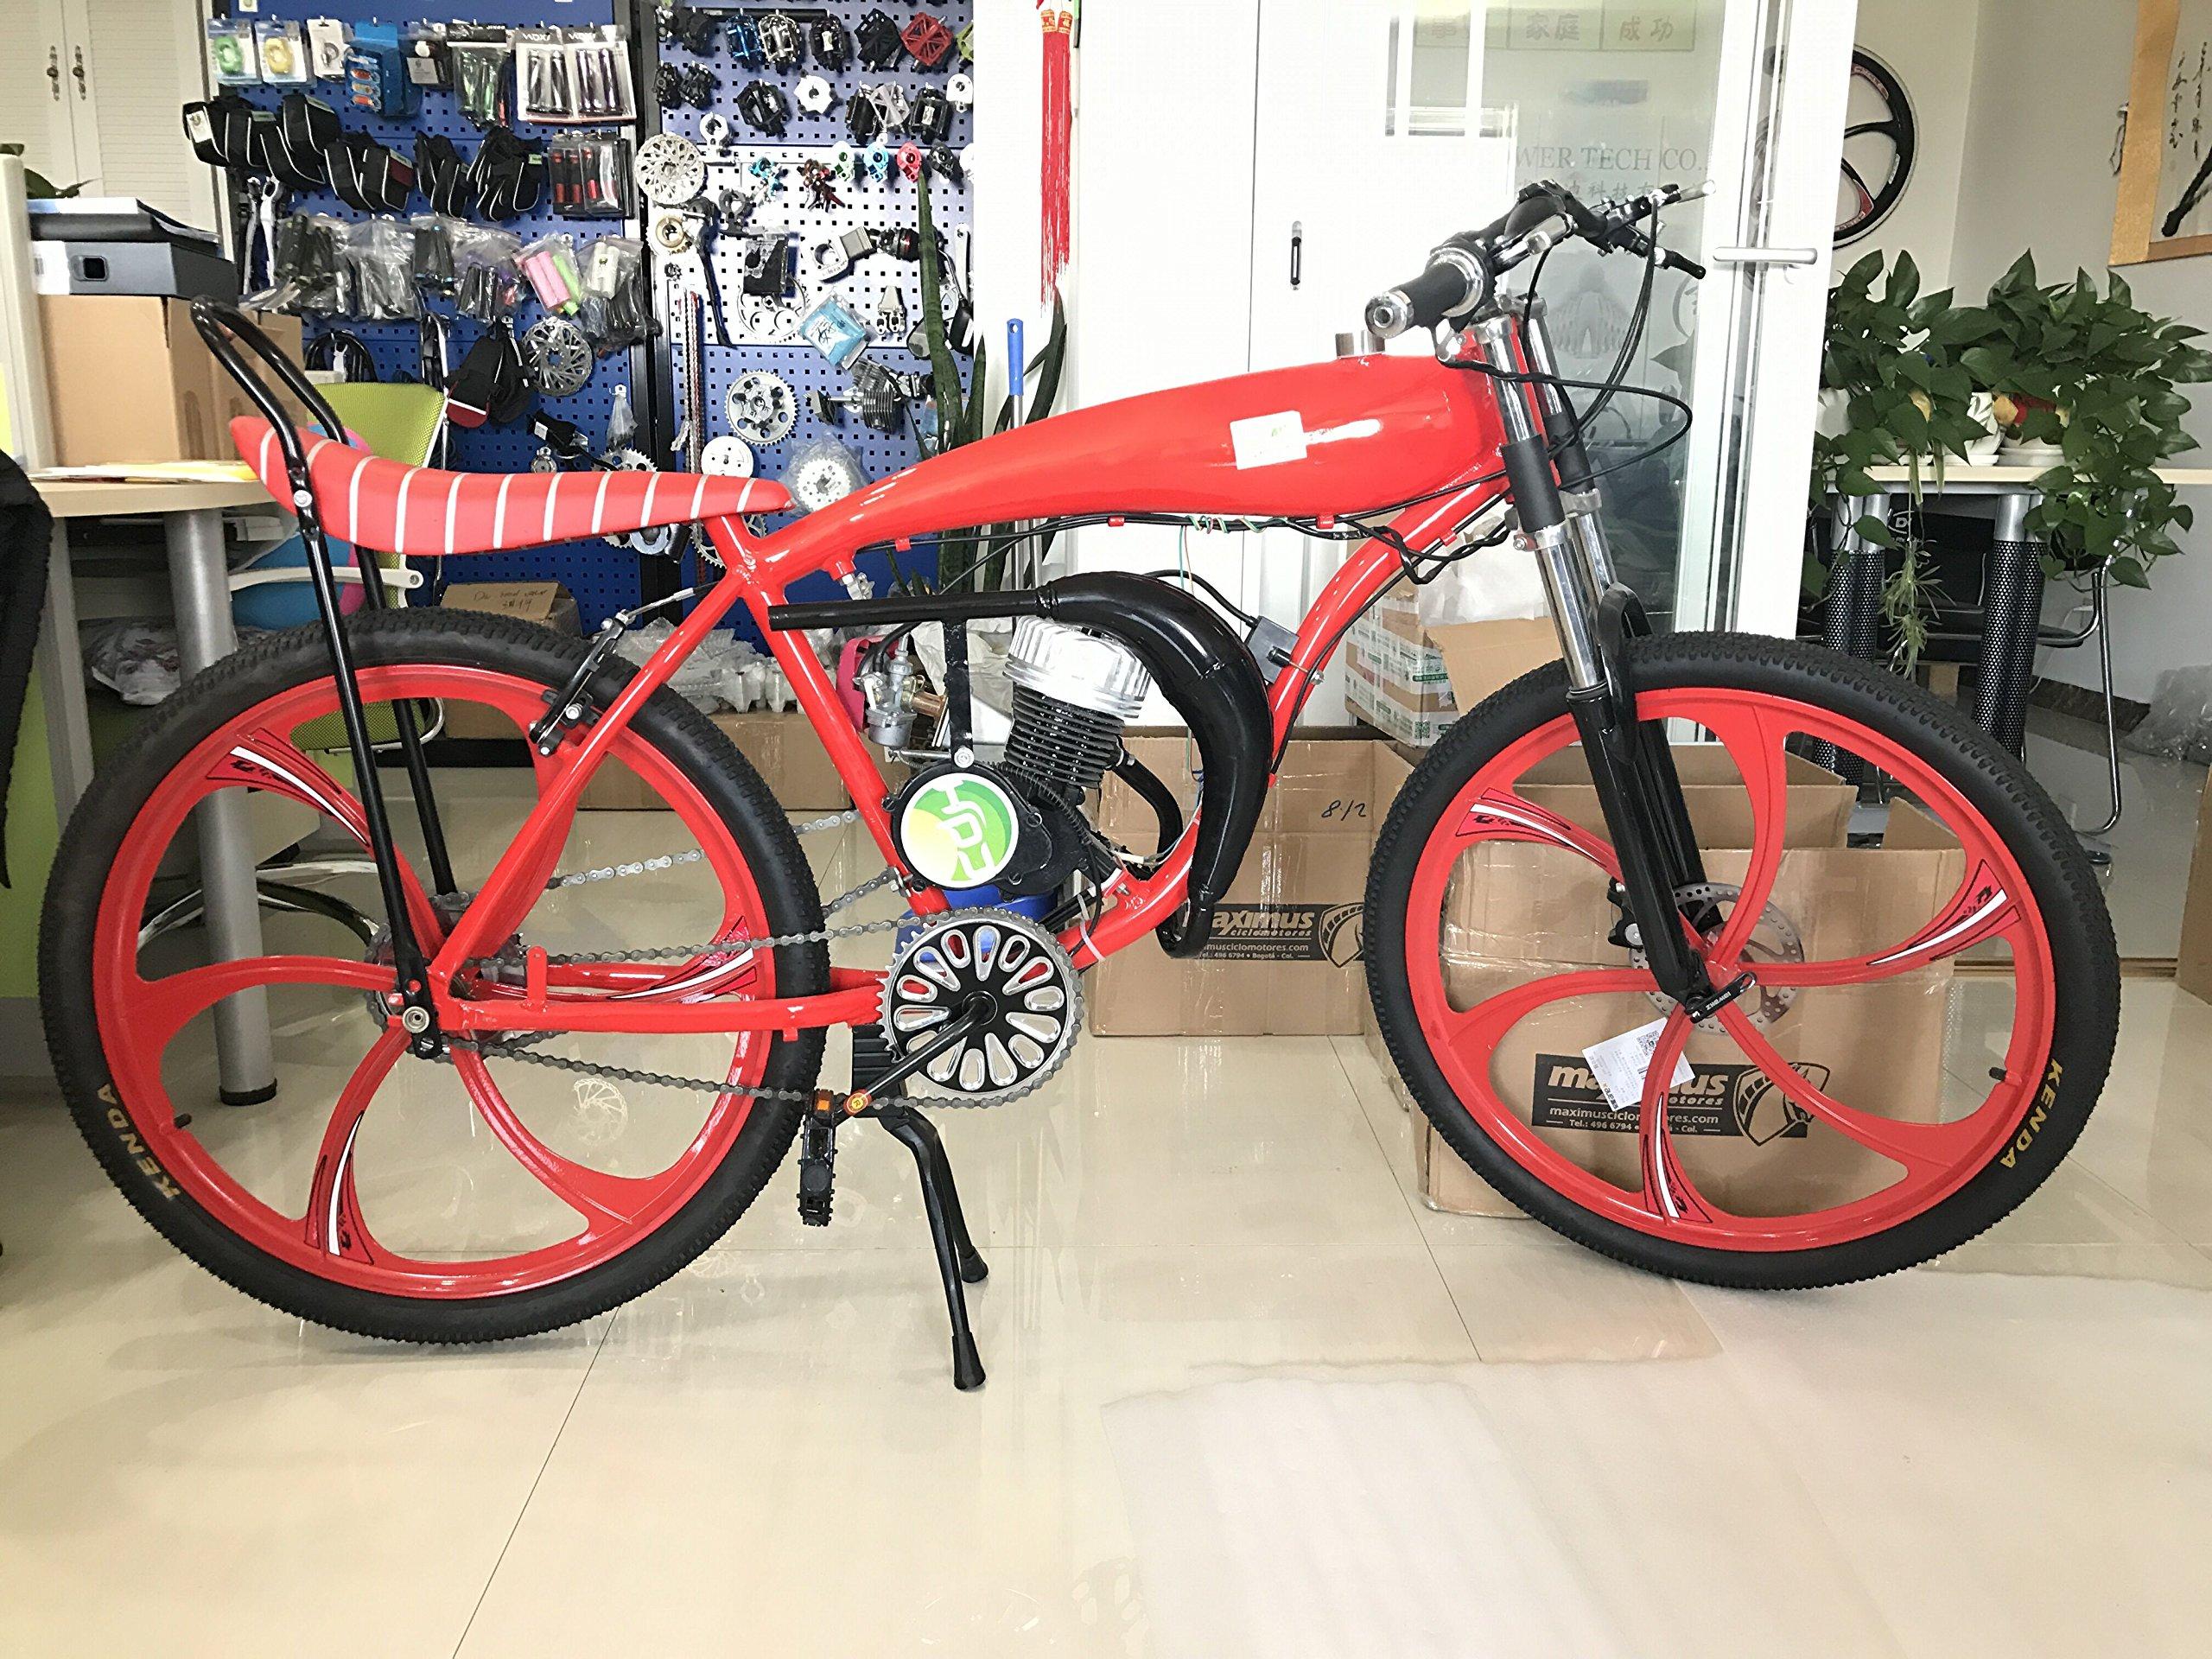 CDHPOWER CDH66 muffler black - 2 stroke gas motor engine kit- Gas Motorized Bicycle